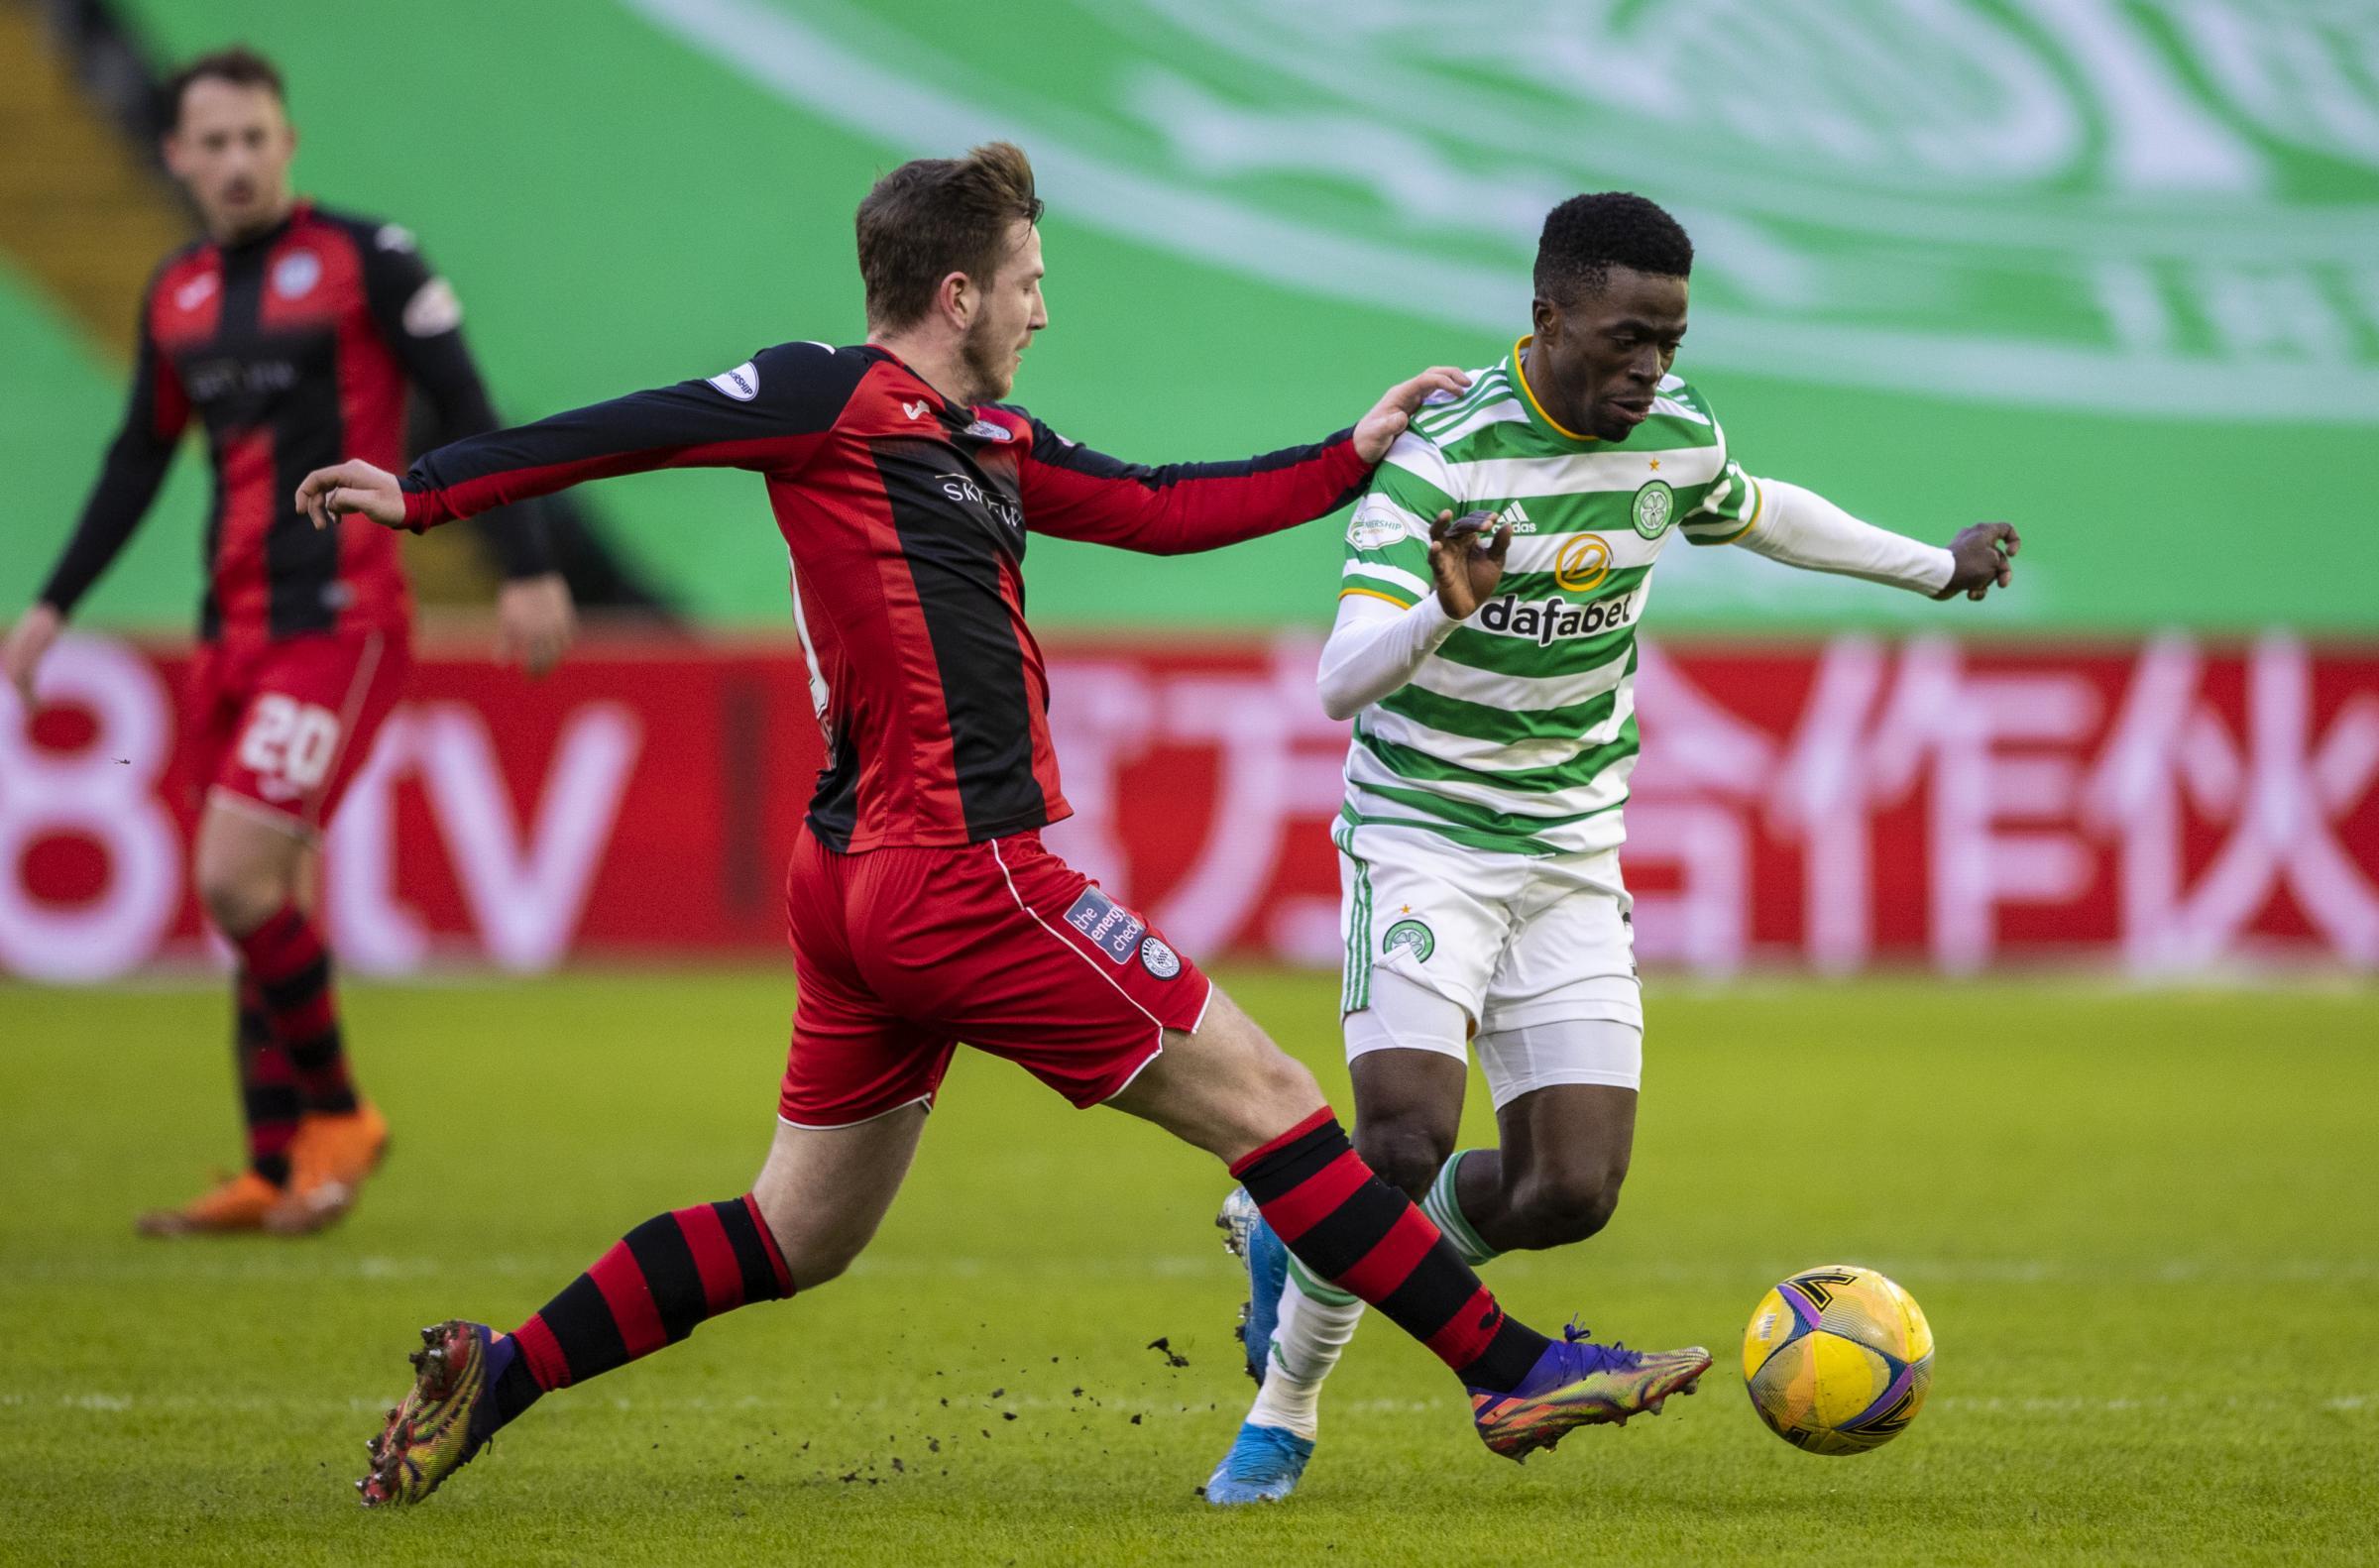 St Mirren have no fears going into Celtic clash after Parkhead triumph, says Kyle McAllister